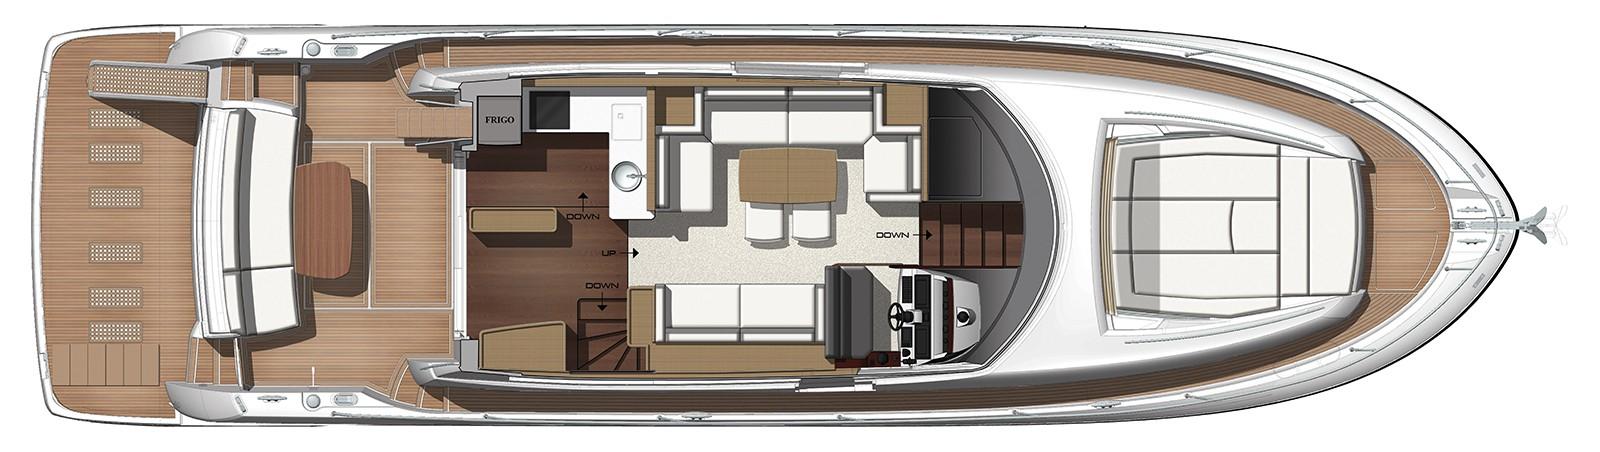 P560-Plan-Main-deck-2017-